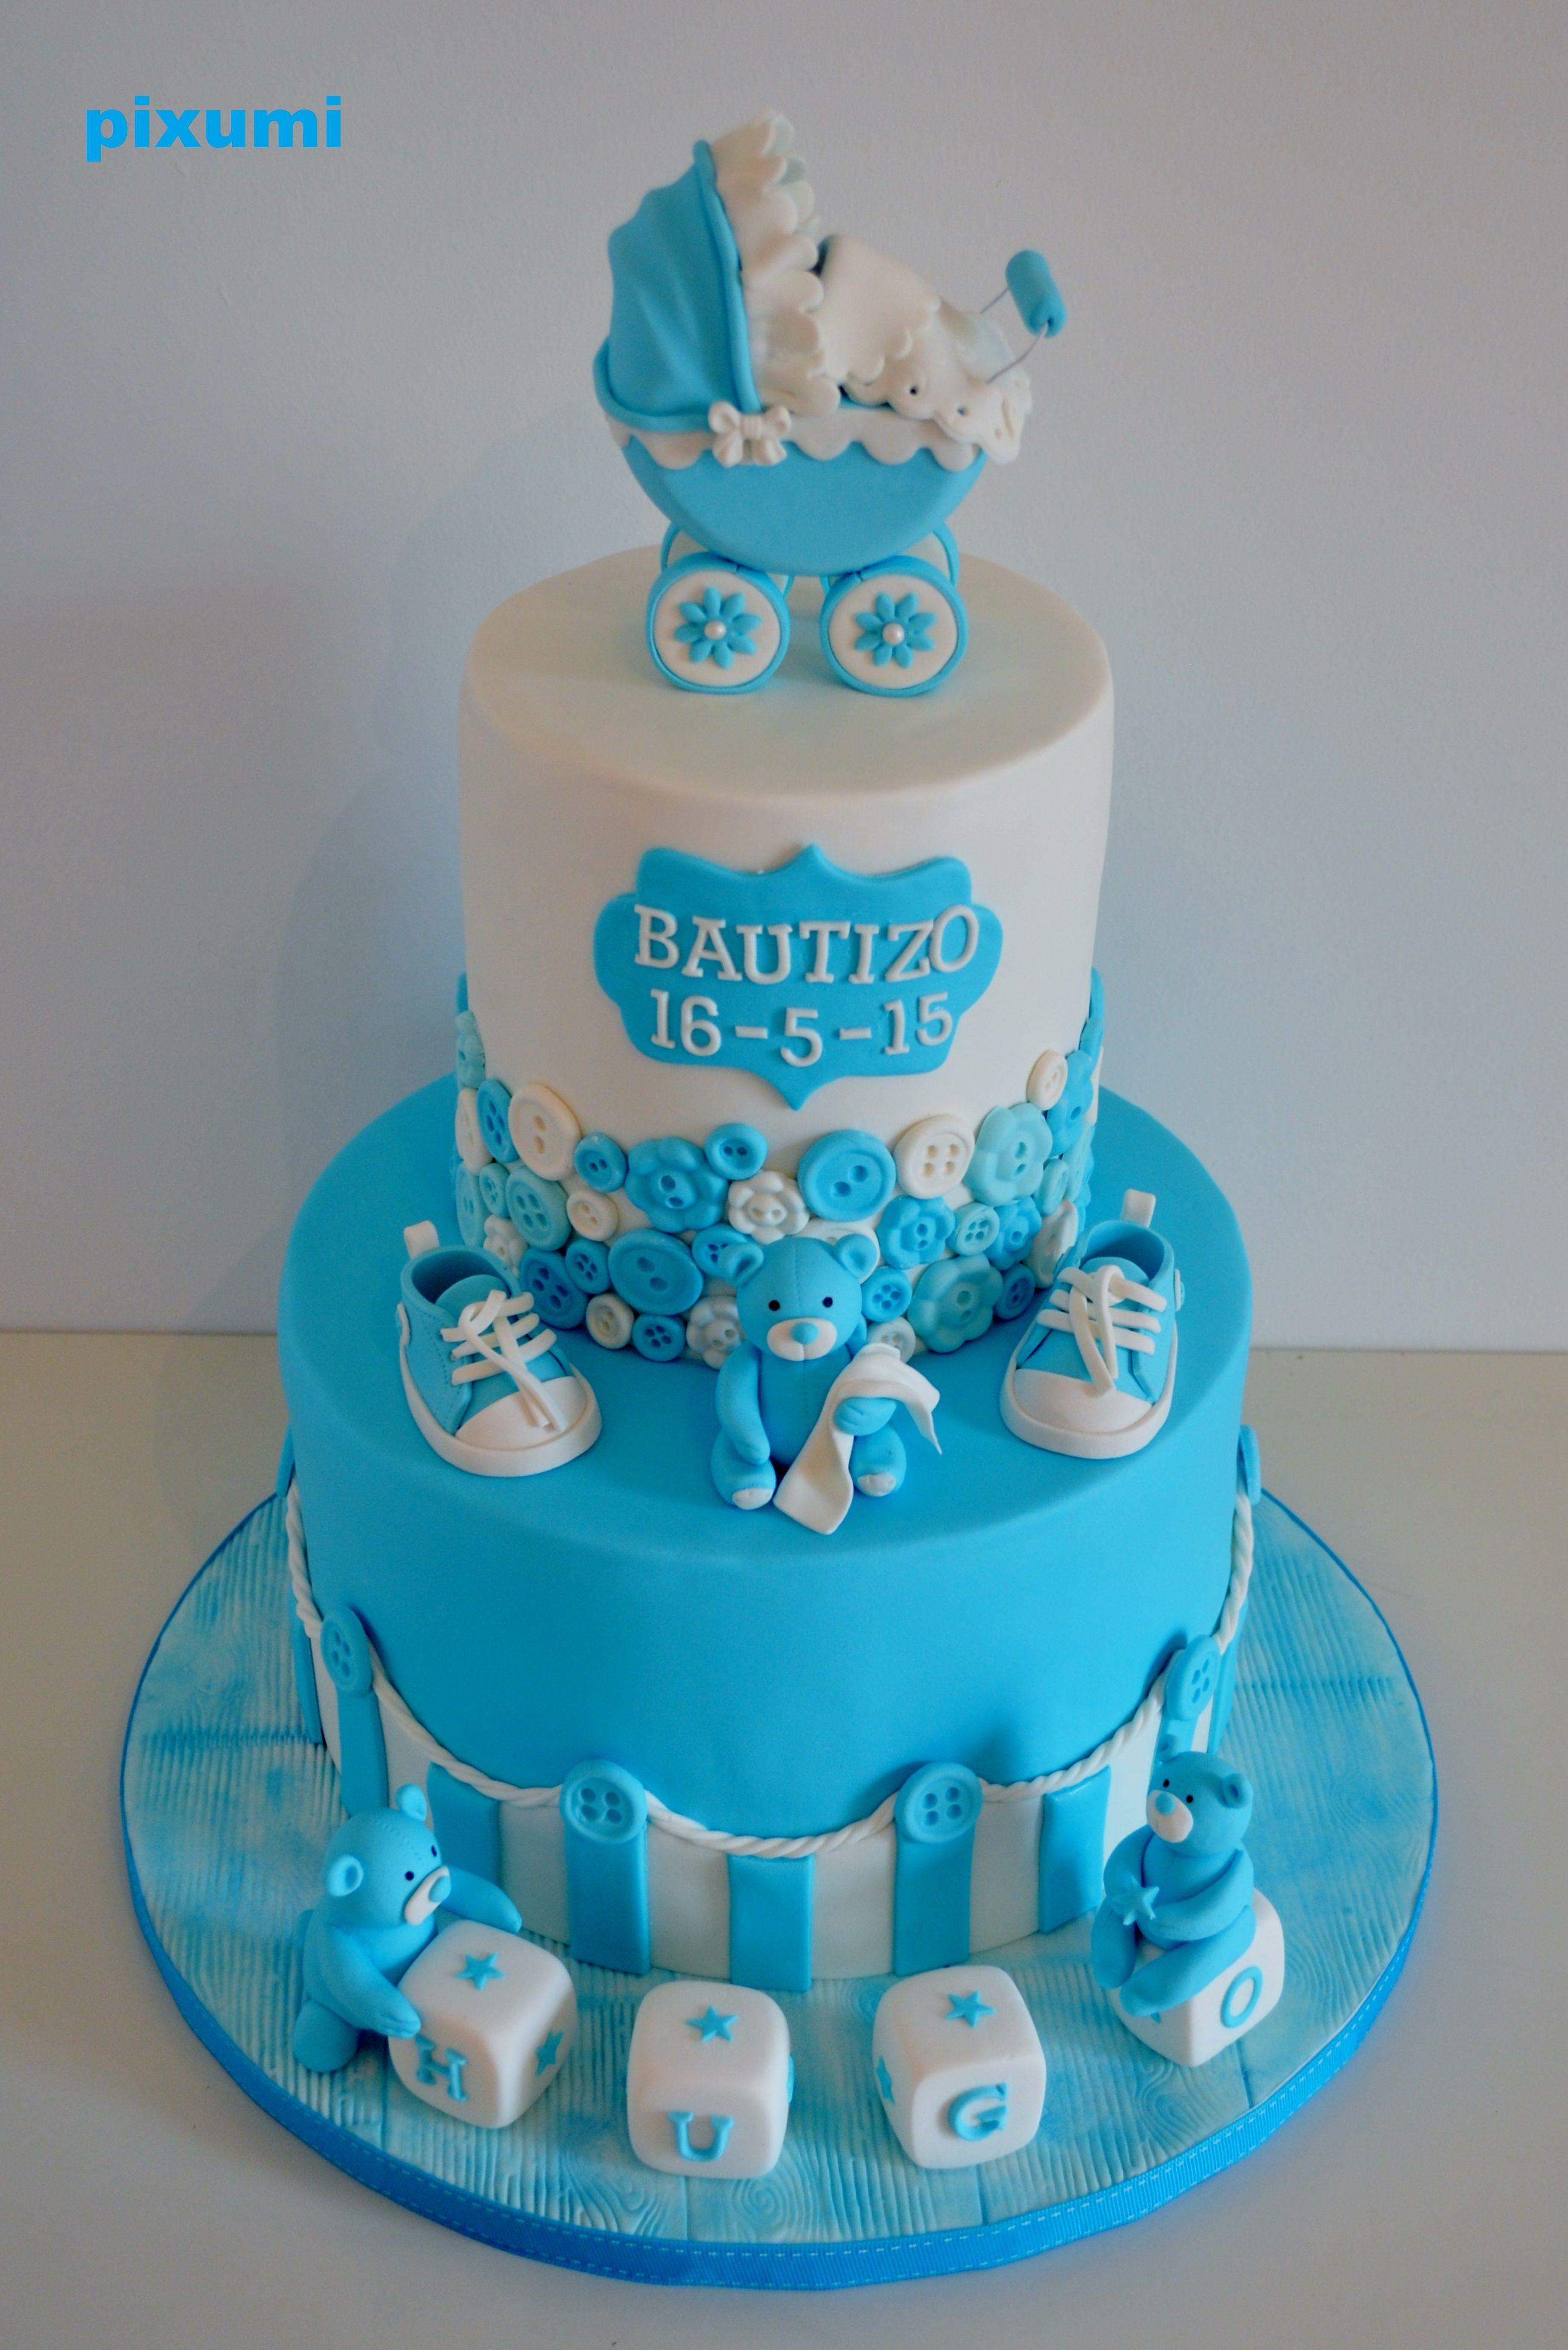 Pastel Bautizo Niño Cake Tarta Fondant Bautizo Baby Shower Niño